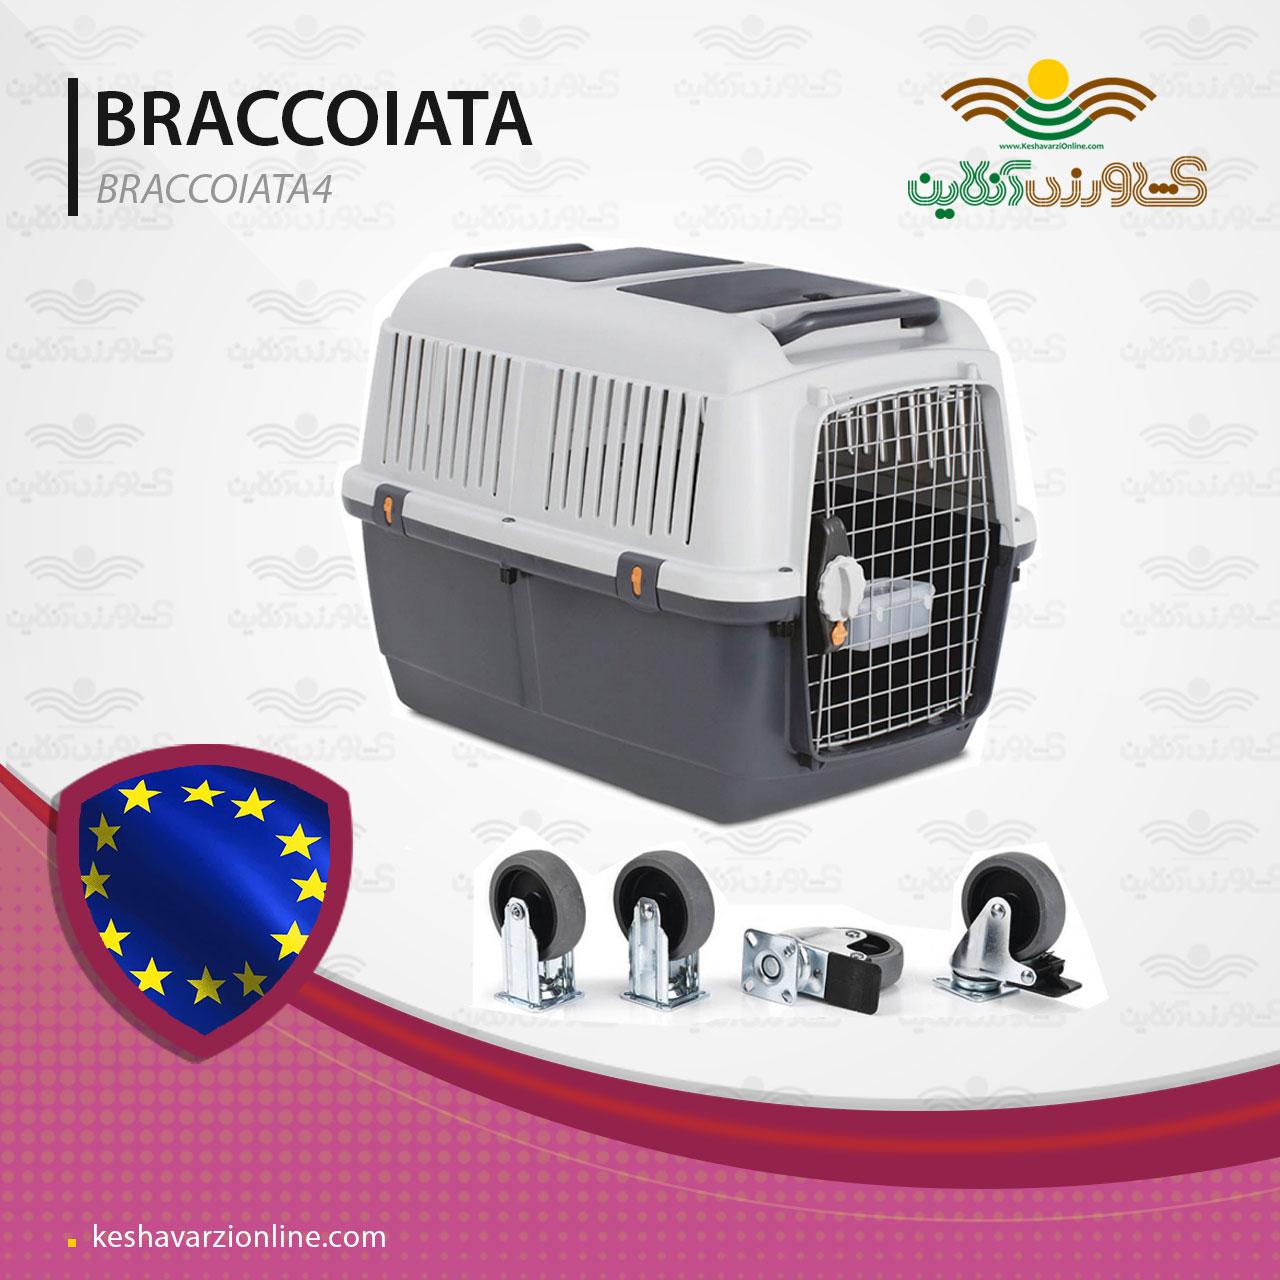 باکس حمل سگ BRACCOIATA